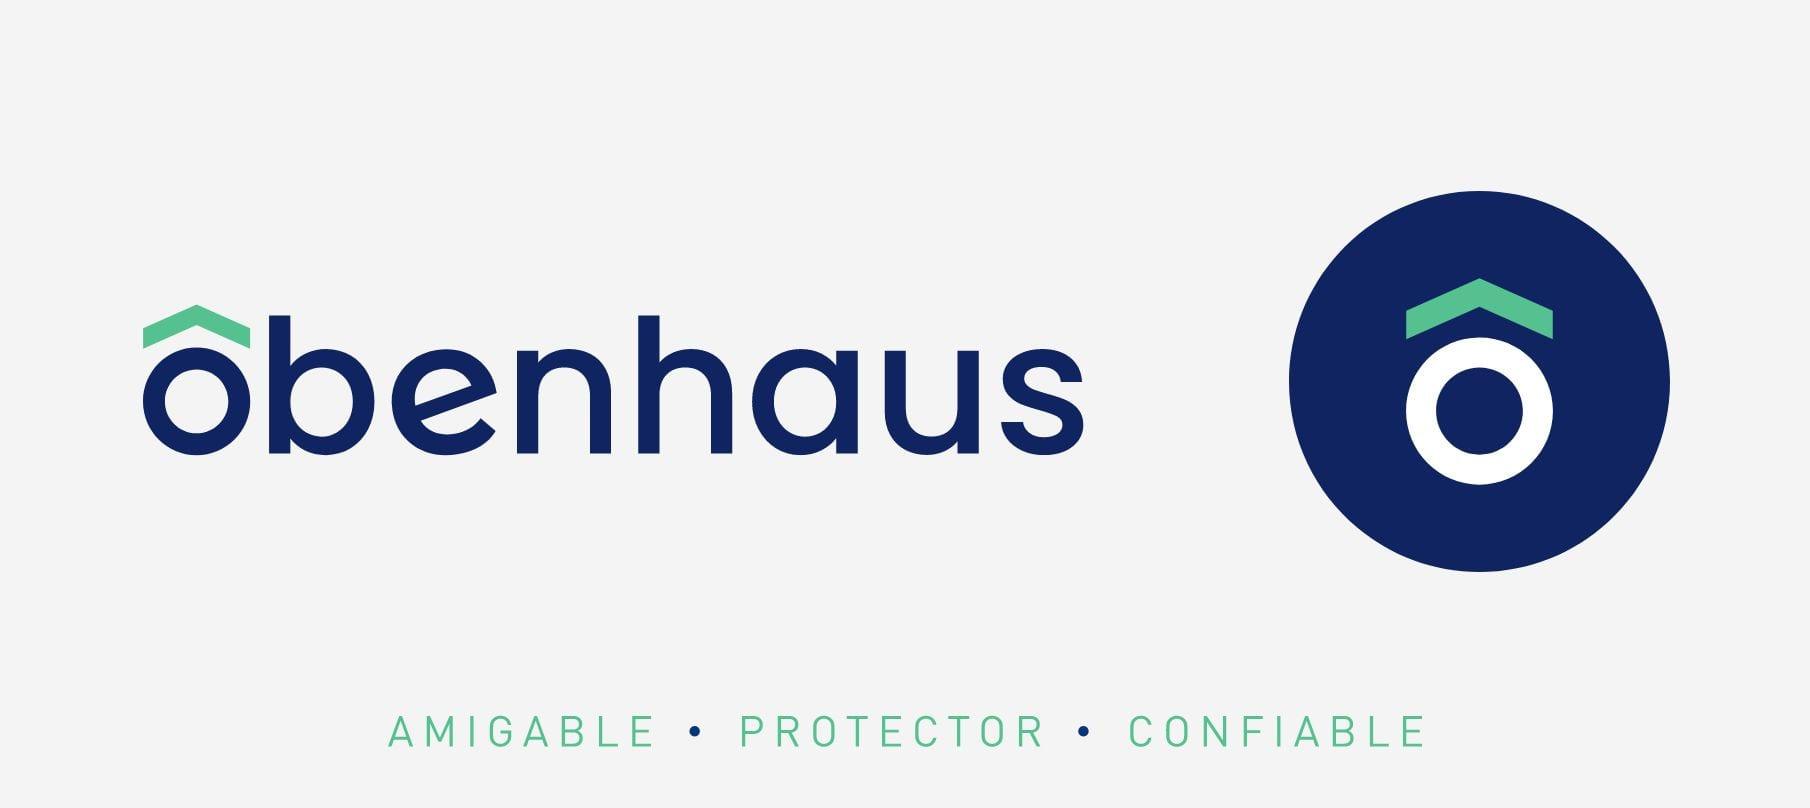 Obenhaus-Branding-2